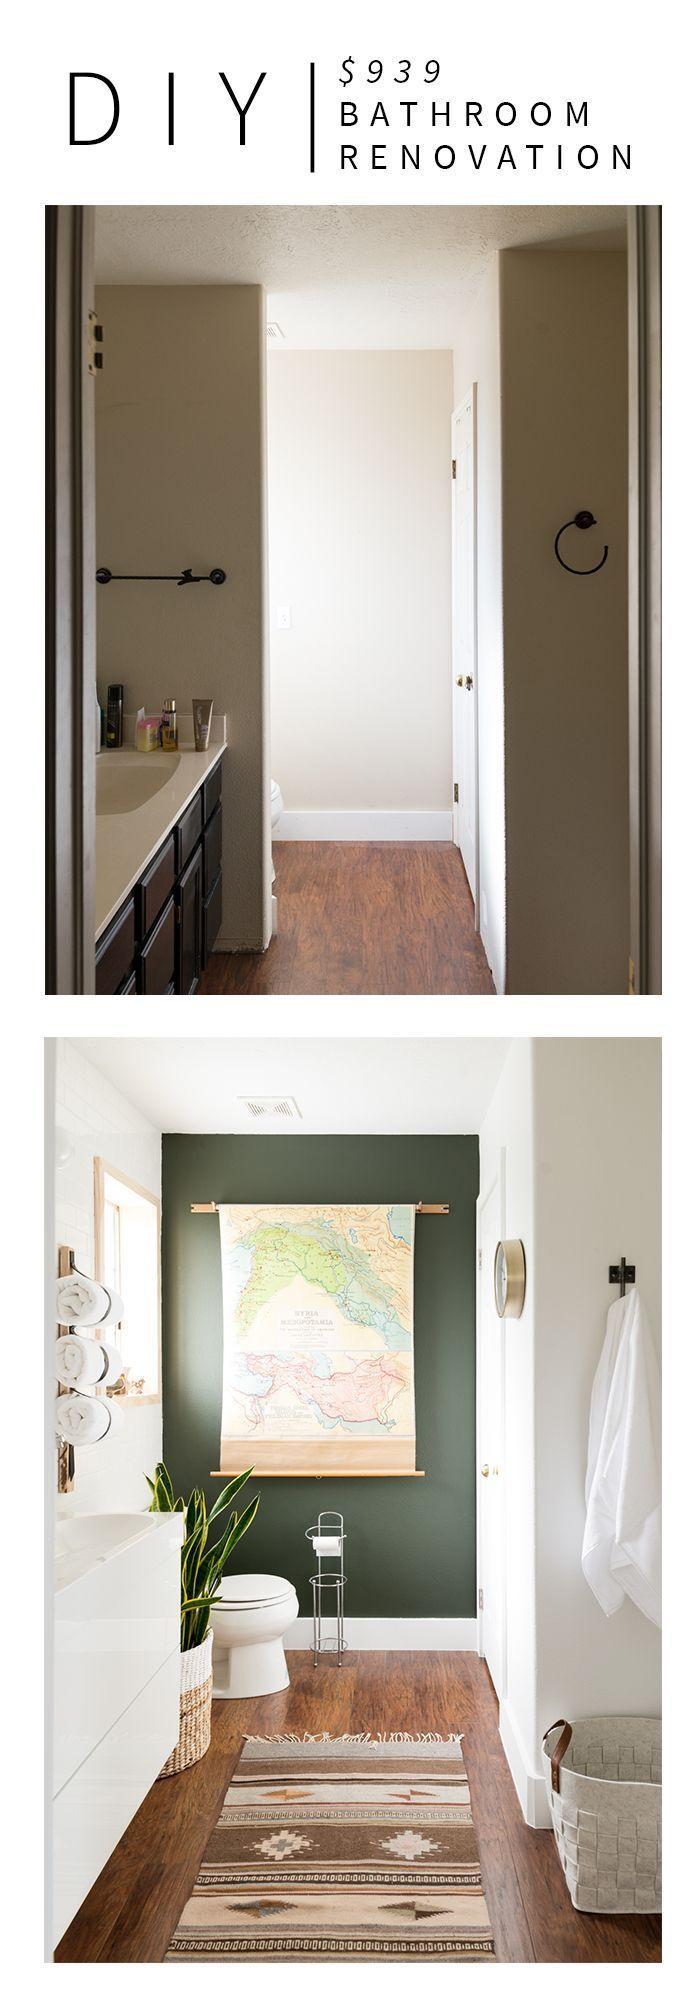 Bathroom Remodel Ideas Diy 493 best bathroom ideas images on pinterest | bathroom ideas, room